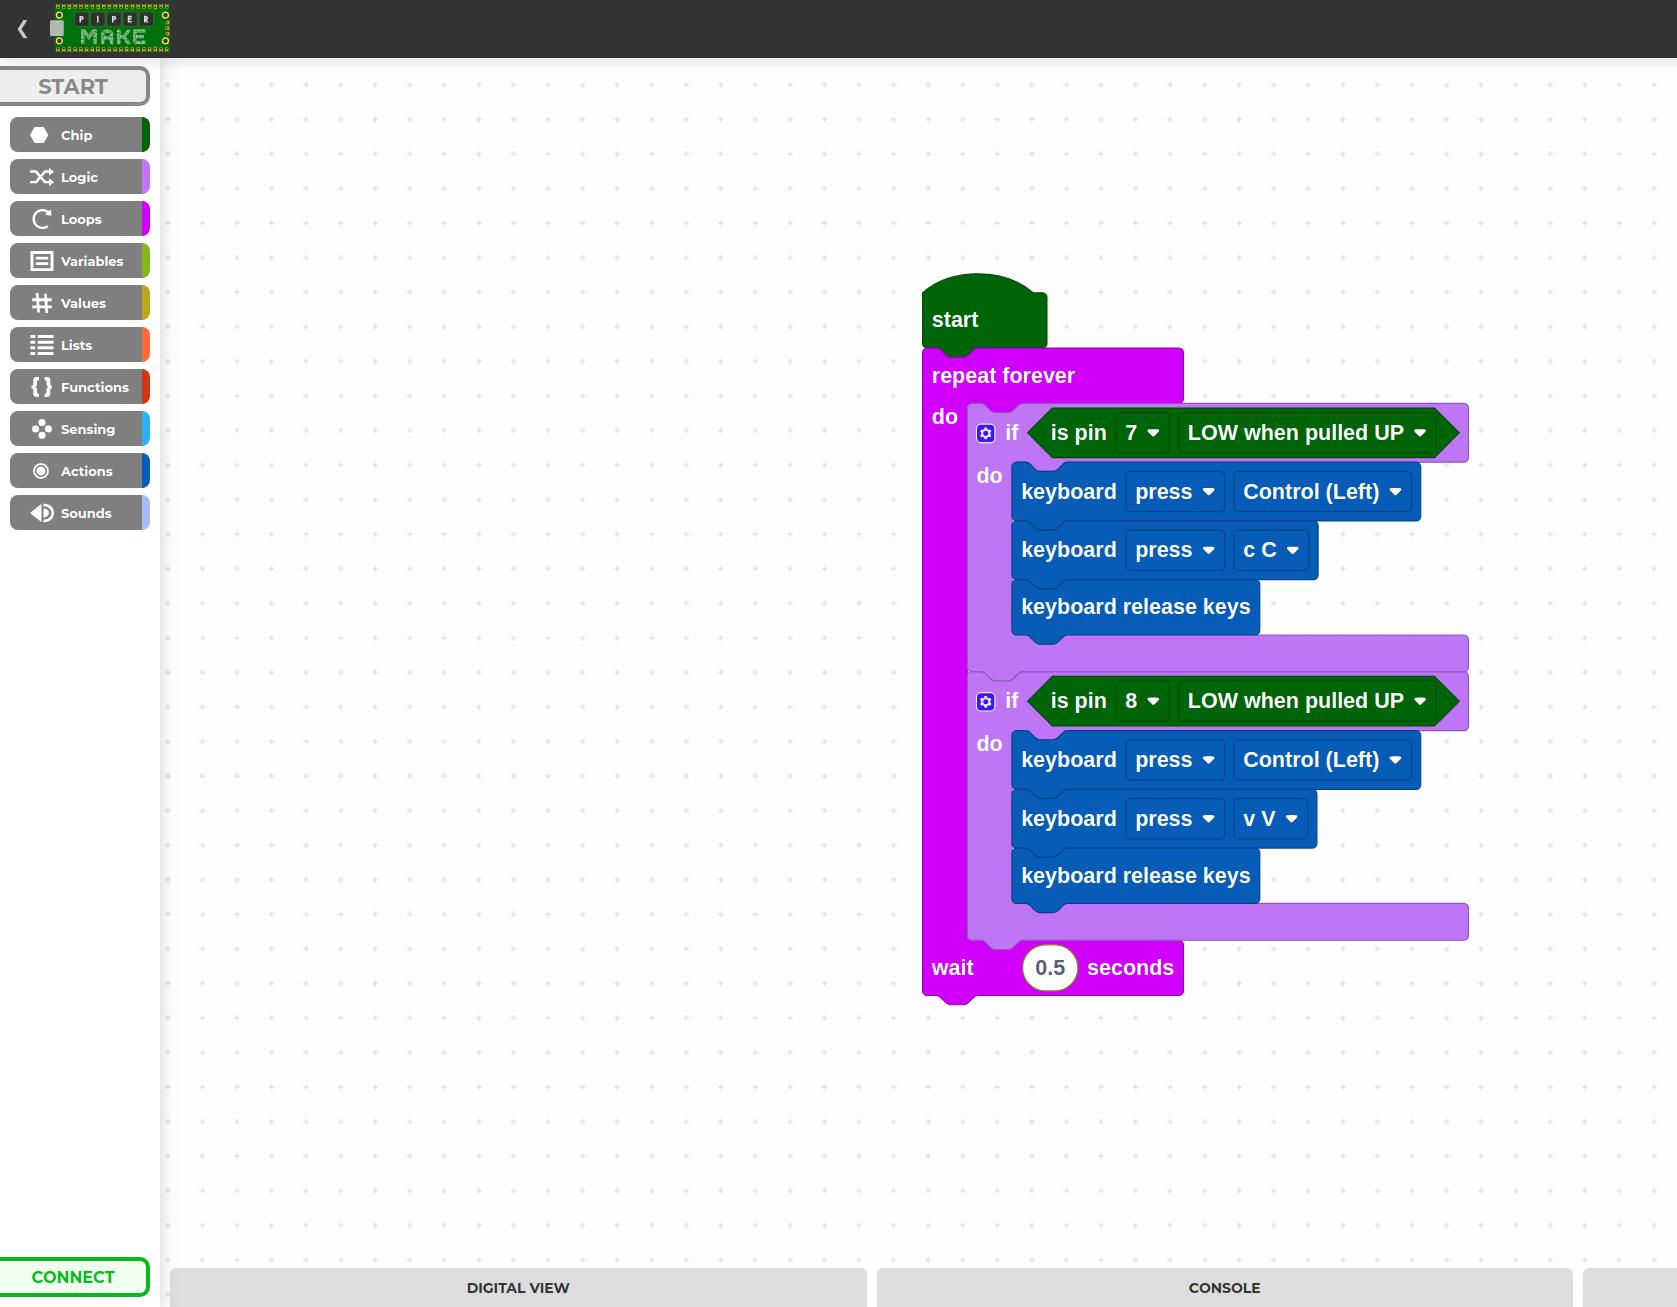 raspberry_pi_Screenshot_from_2021-03-24_16-56-55.png